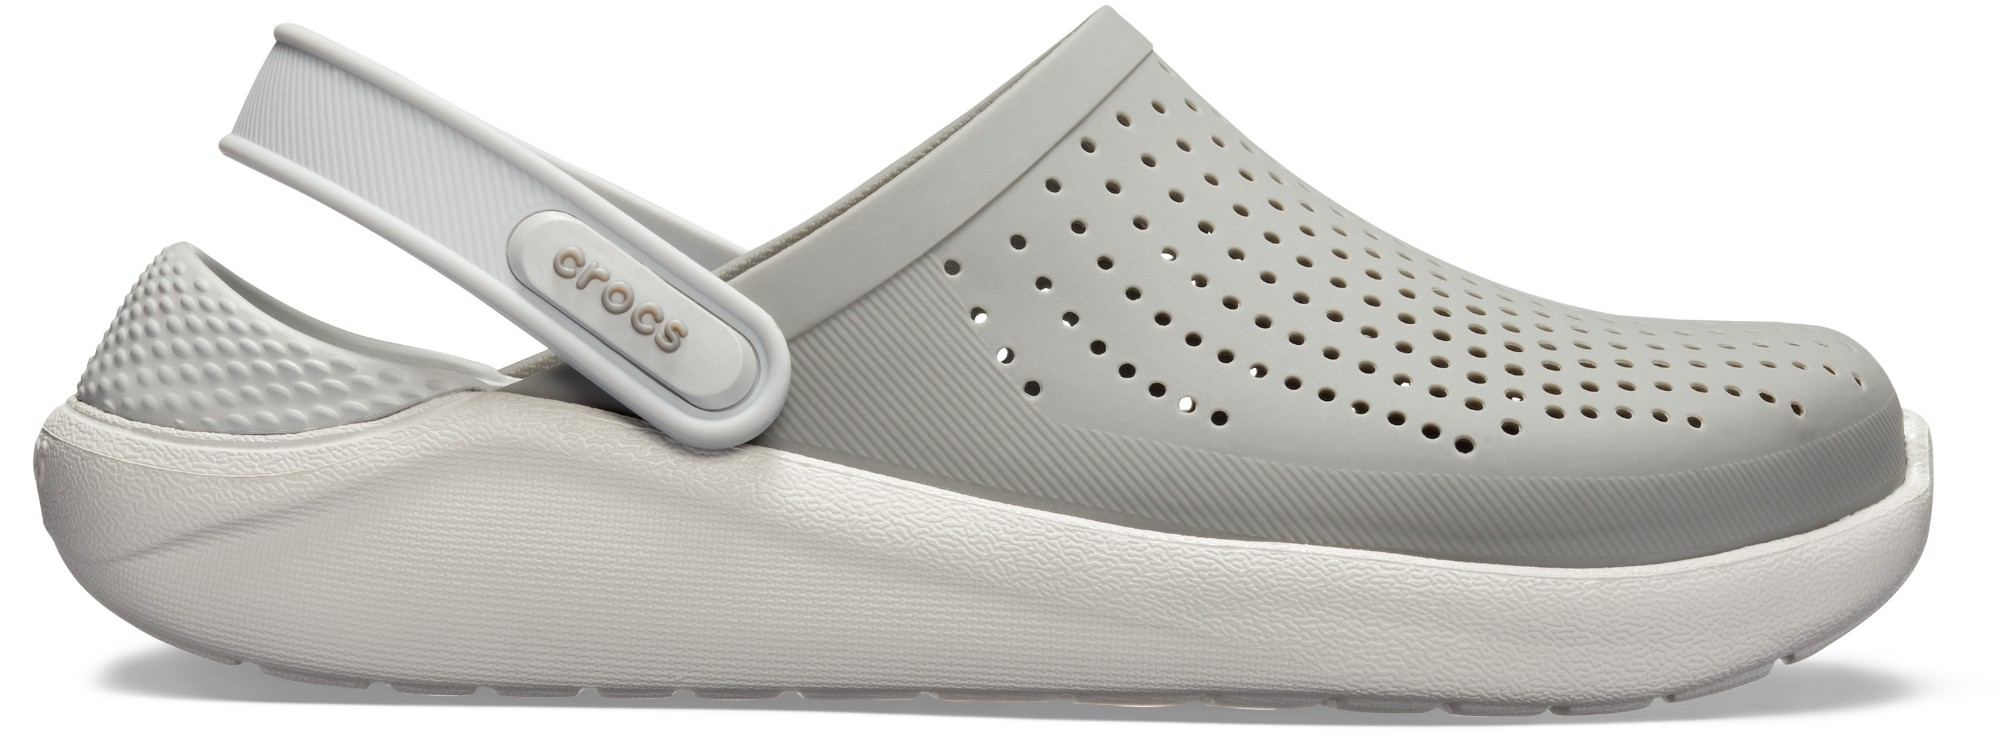 Crocs™ LiteRide Clog Smoke/Pearl White 39,5